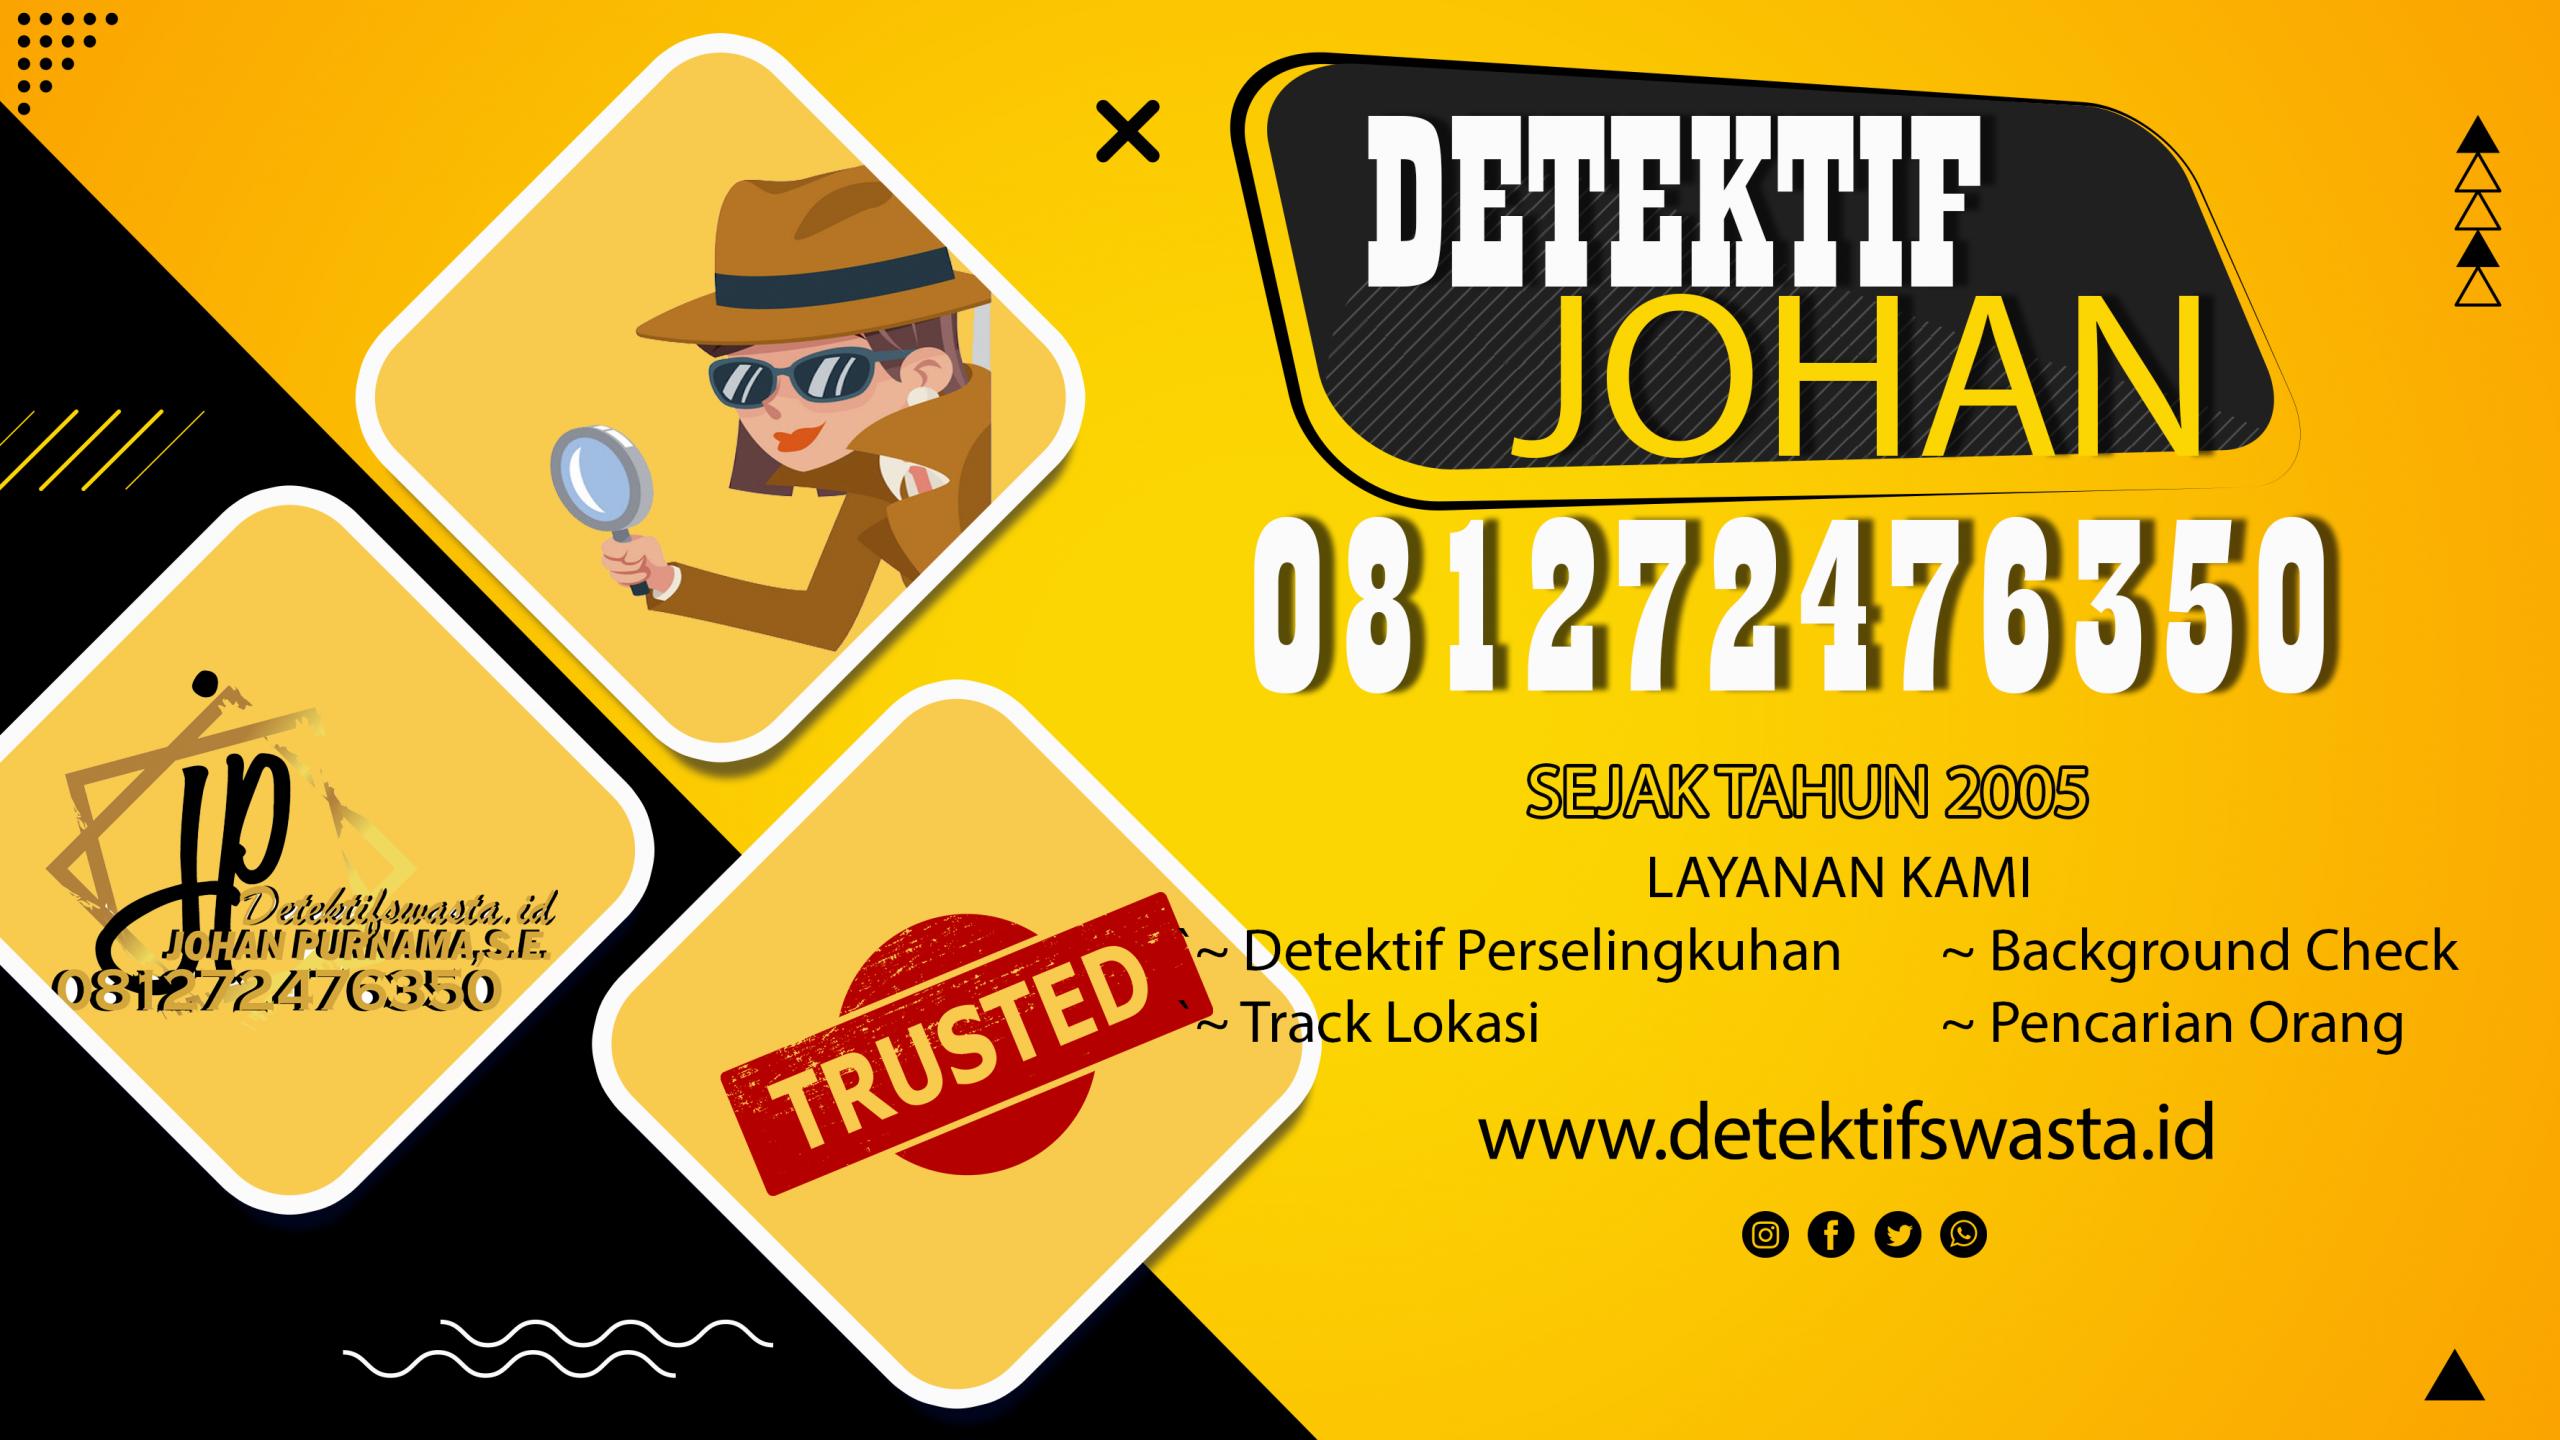 detektif swasta Jasa Detektif Swasta Surabaya Merupakan Jasa Pengintai Orang di Kota Surabaya Banner